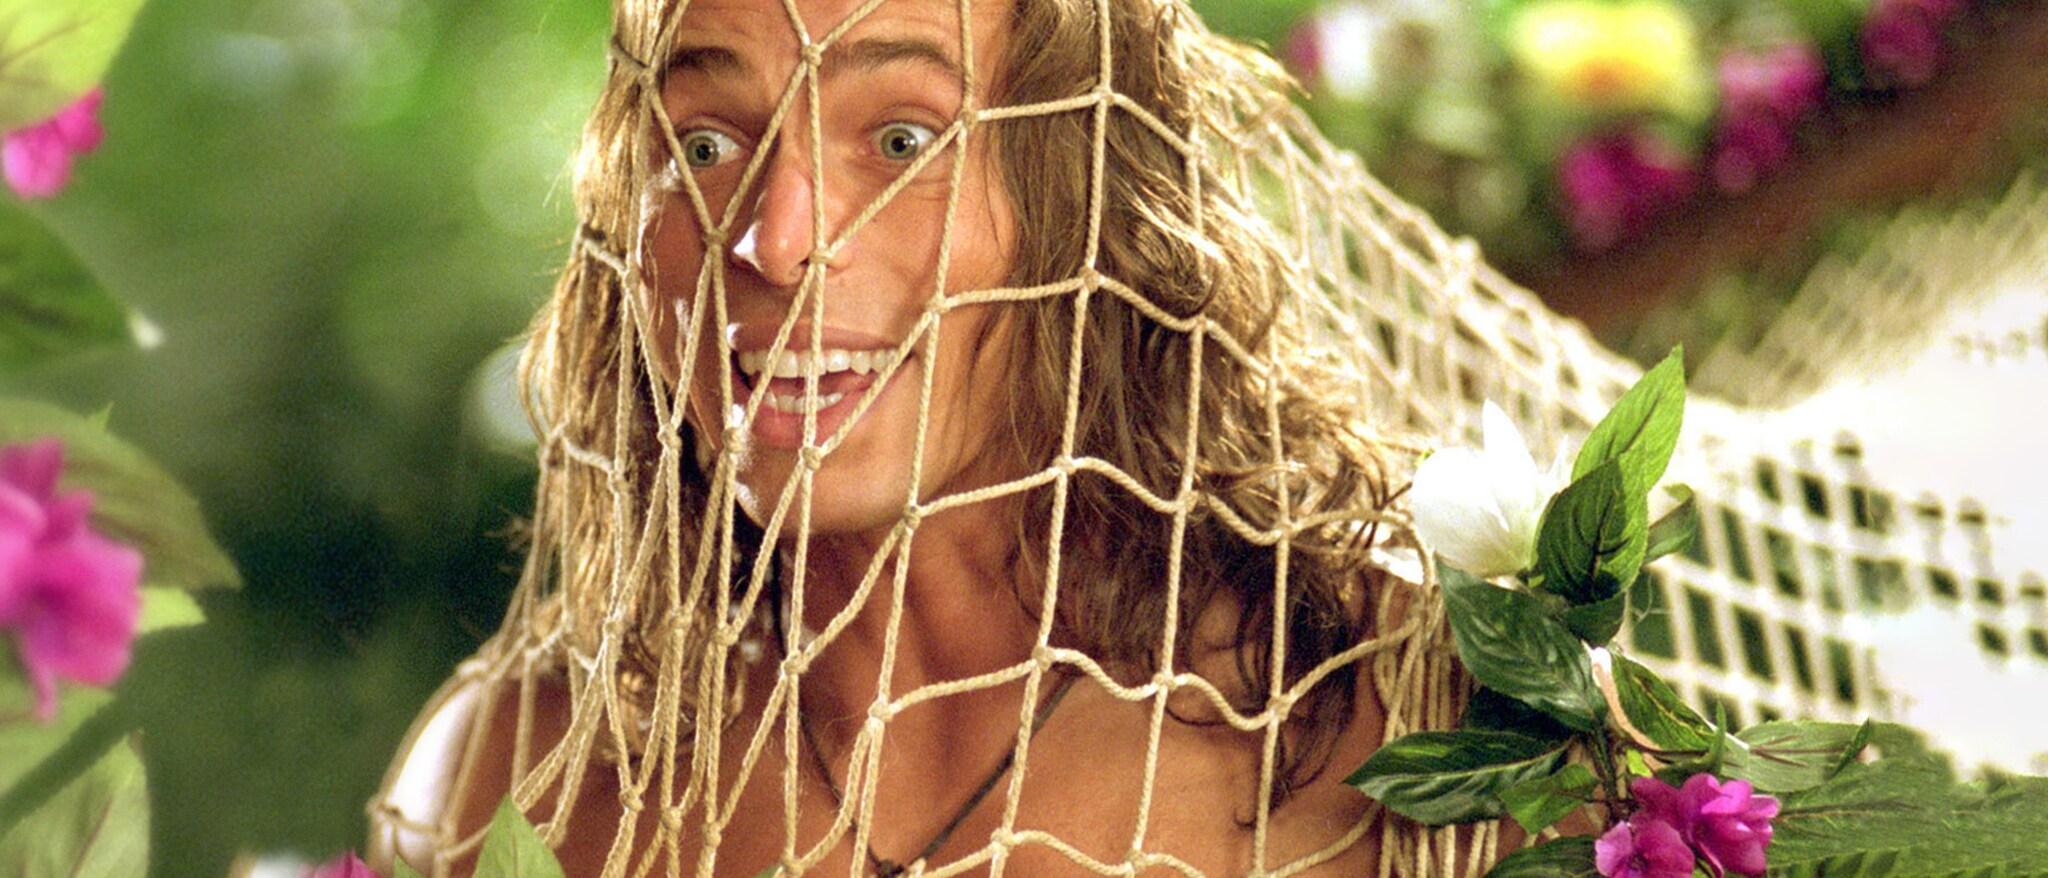 George of the Jungle 2 Hero